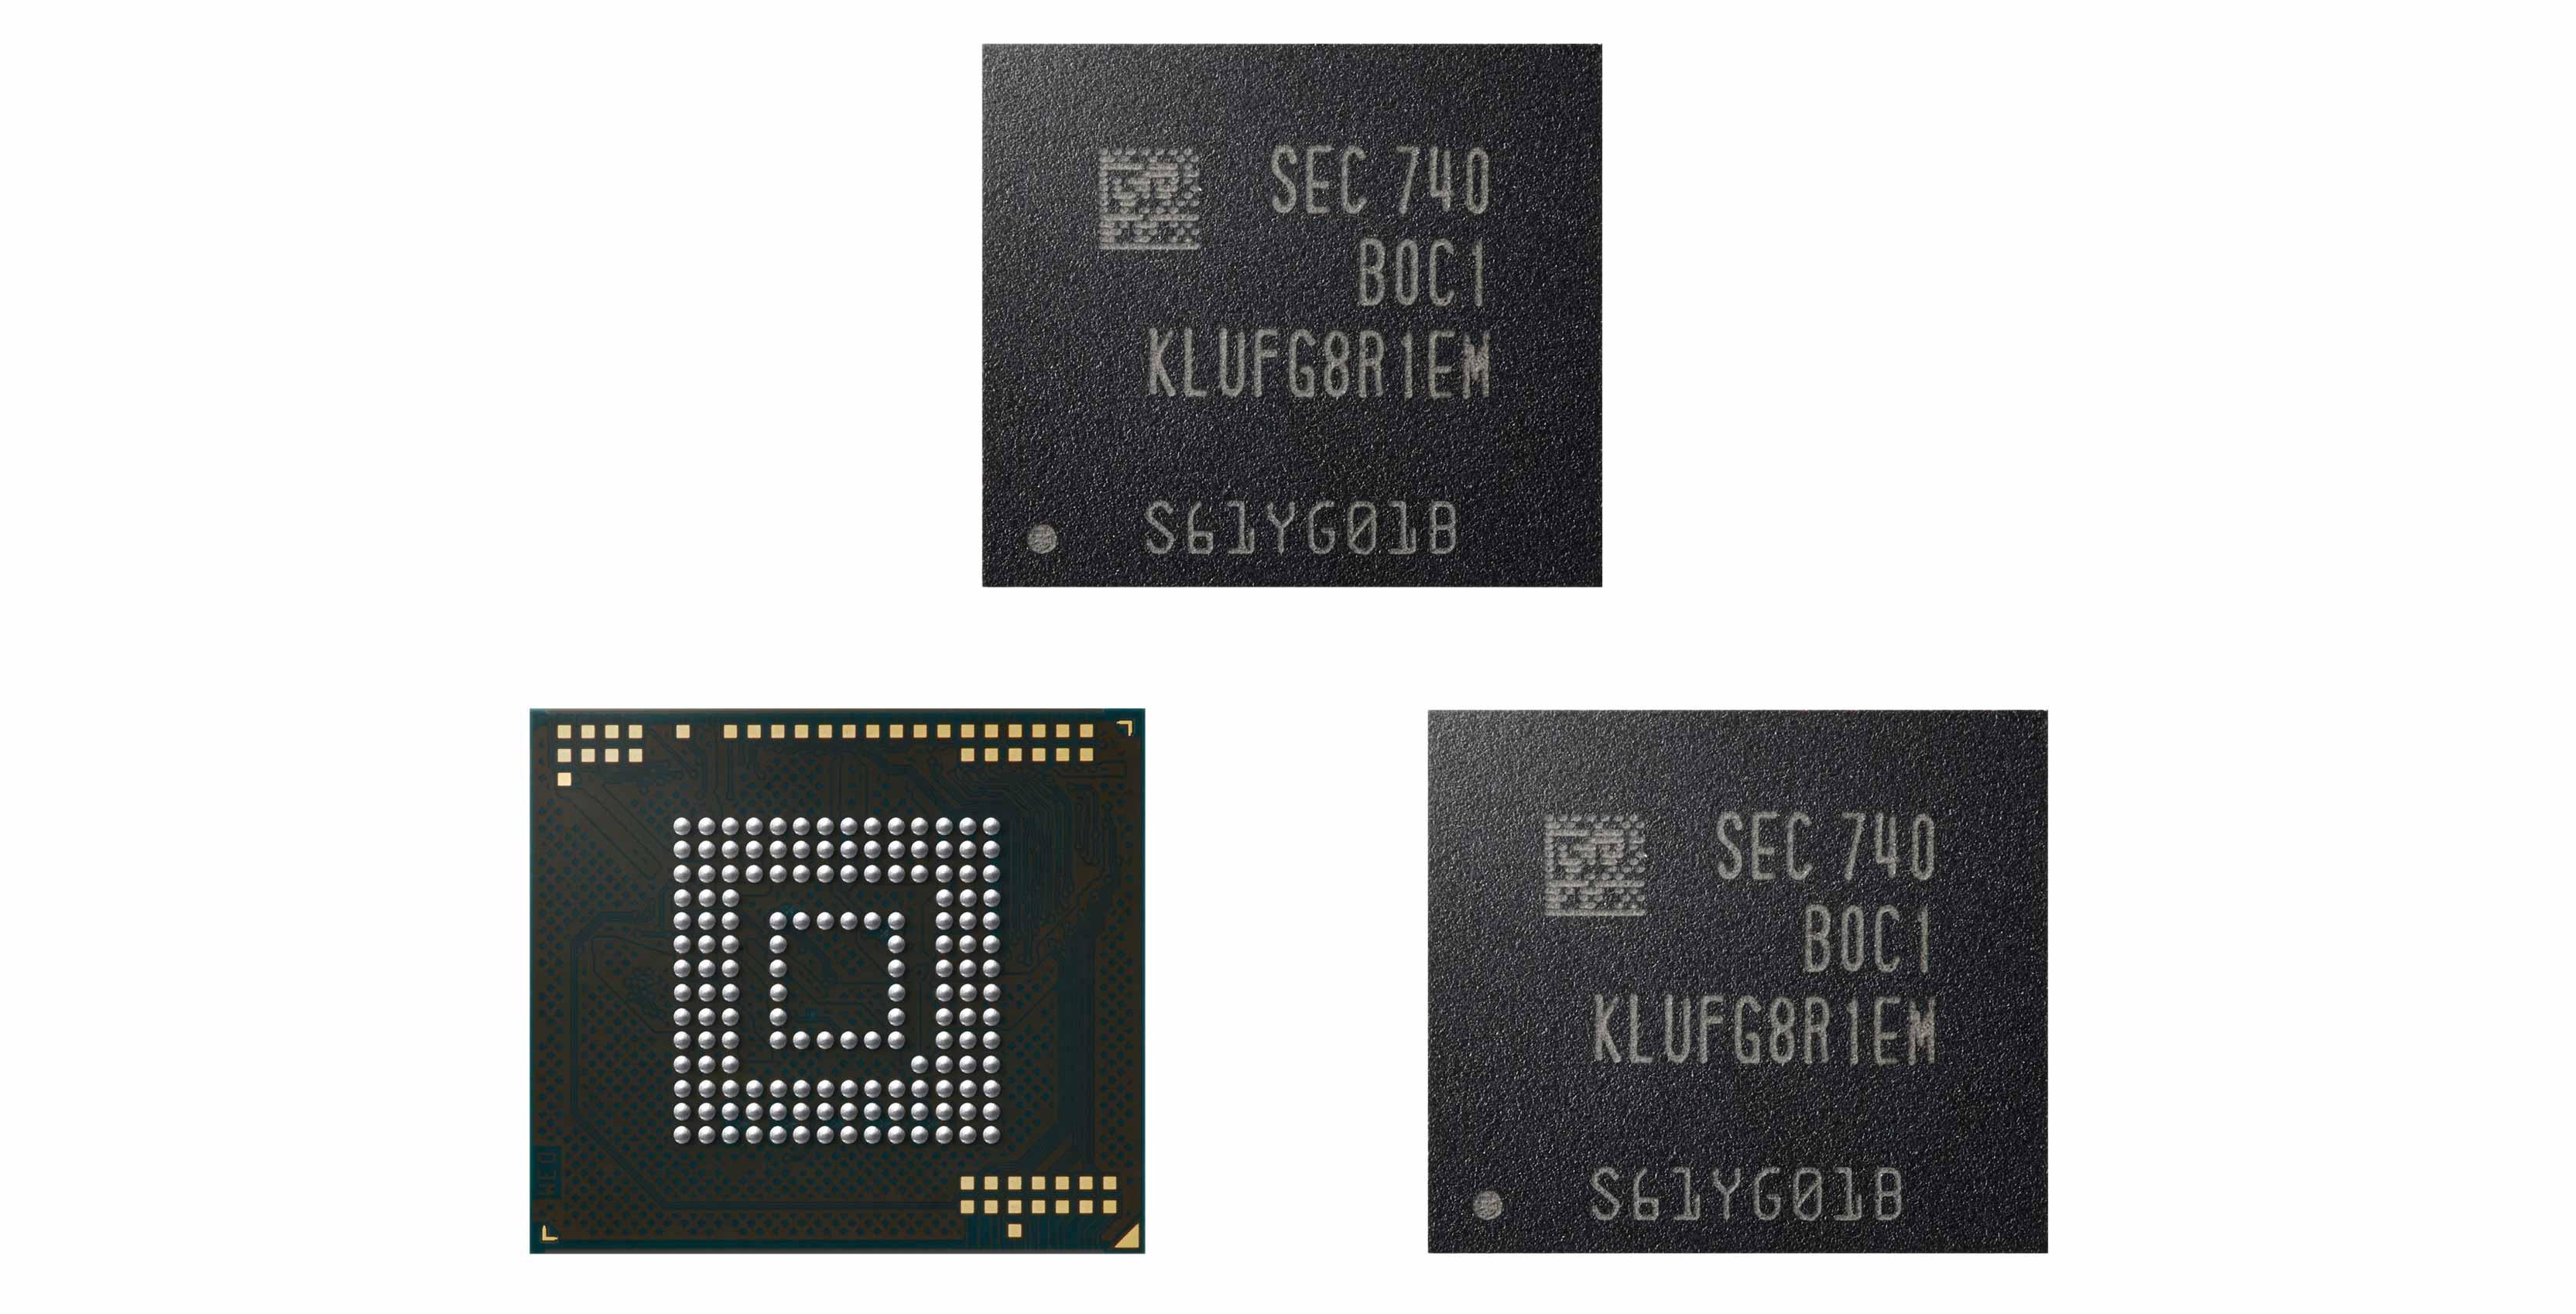 Samsung's new 512GB eUFS NAND chip